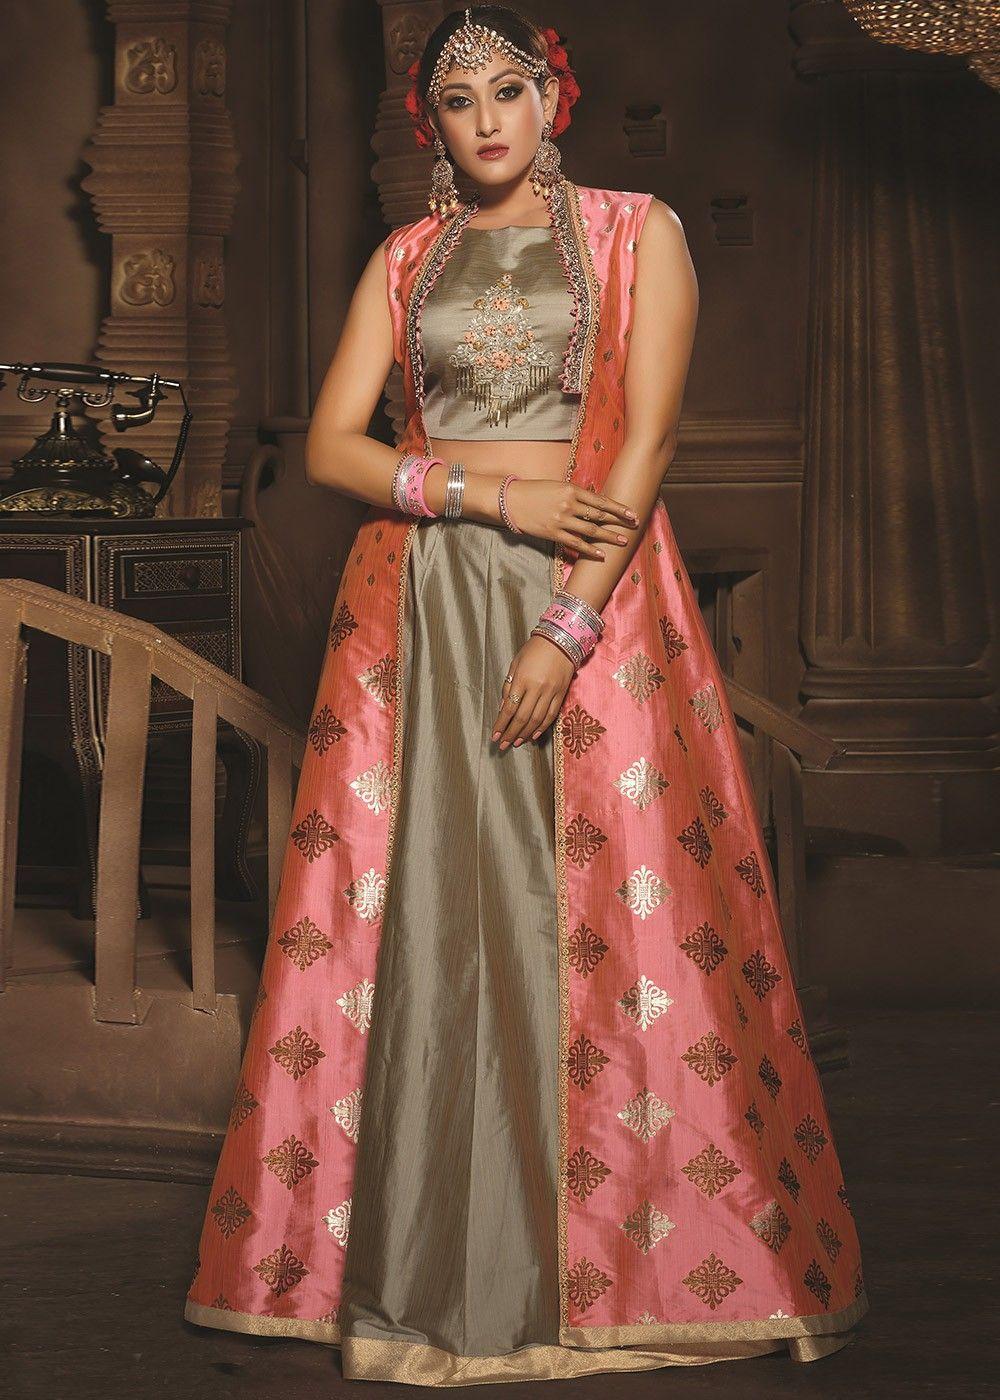 16c9119f1c #Indowesternoutfit #Indowesterngown #Indowesterngowns #Indowesterndress  #Indiangowns #Indowesternfashion #womenfashion #dresses #ladiesfashion  #fashiontips ...